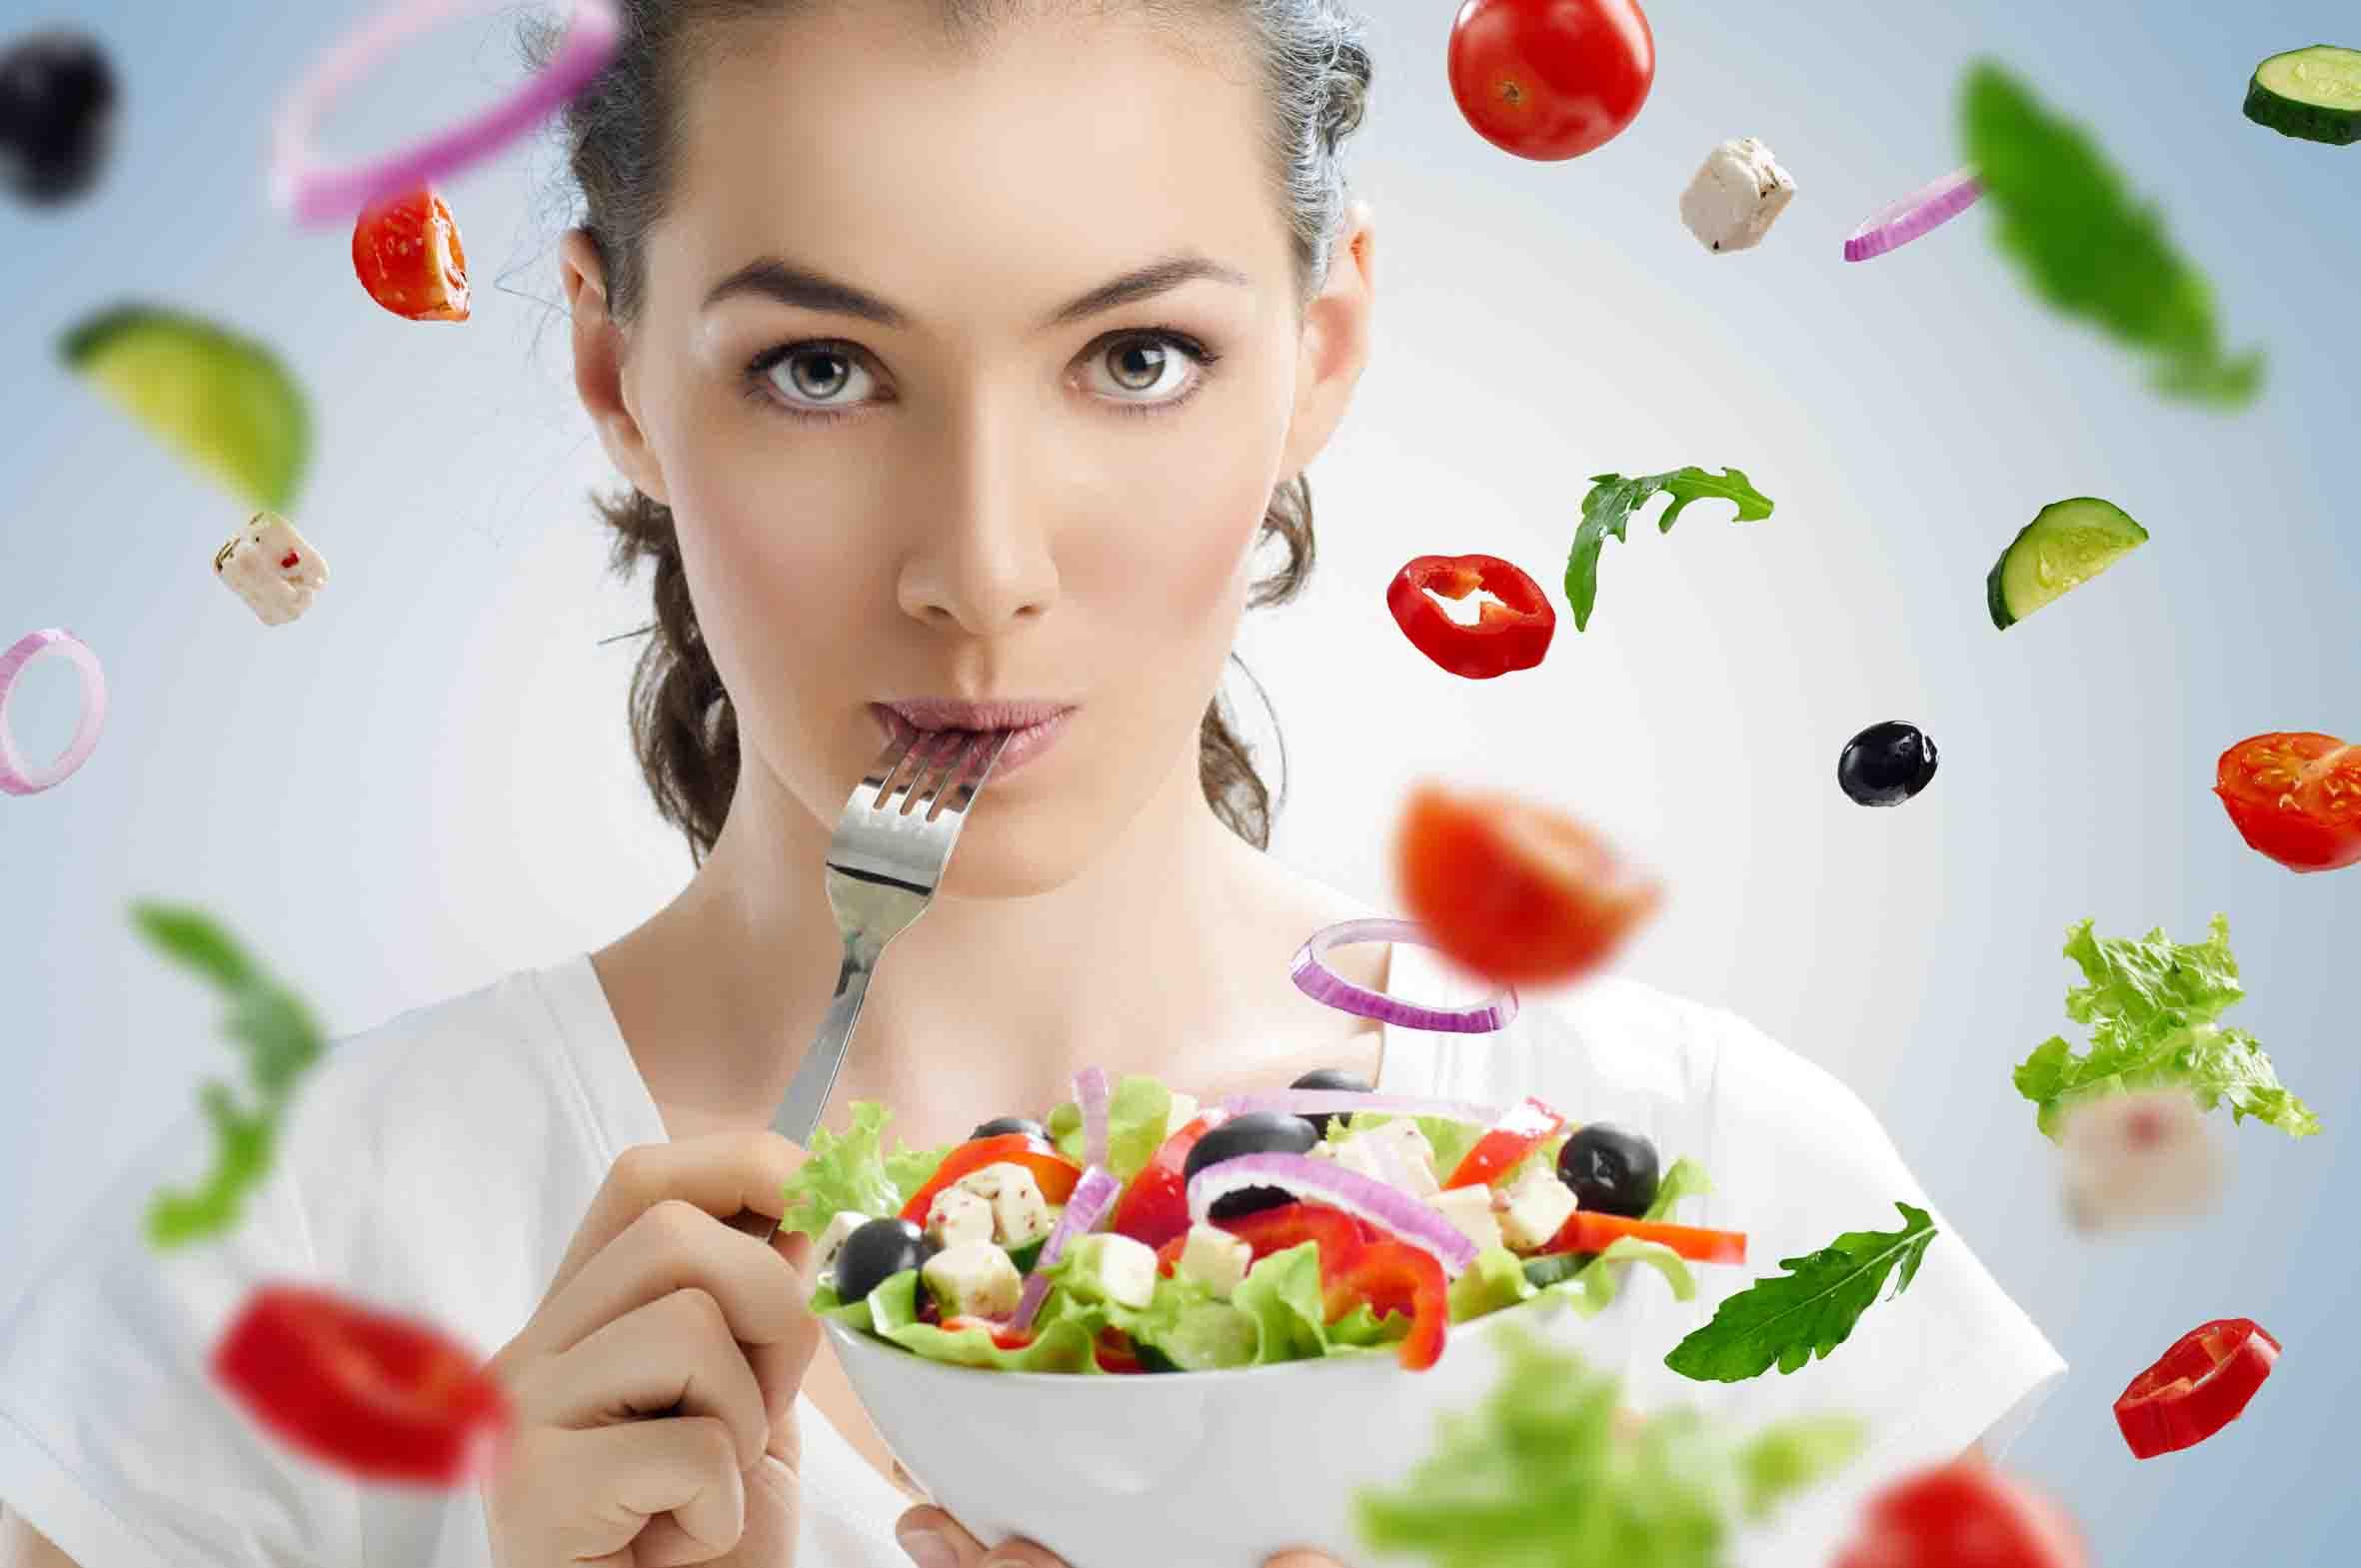 Alergia, intolerância e hipersensibilidade alimentar